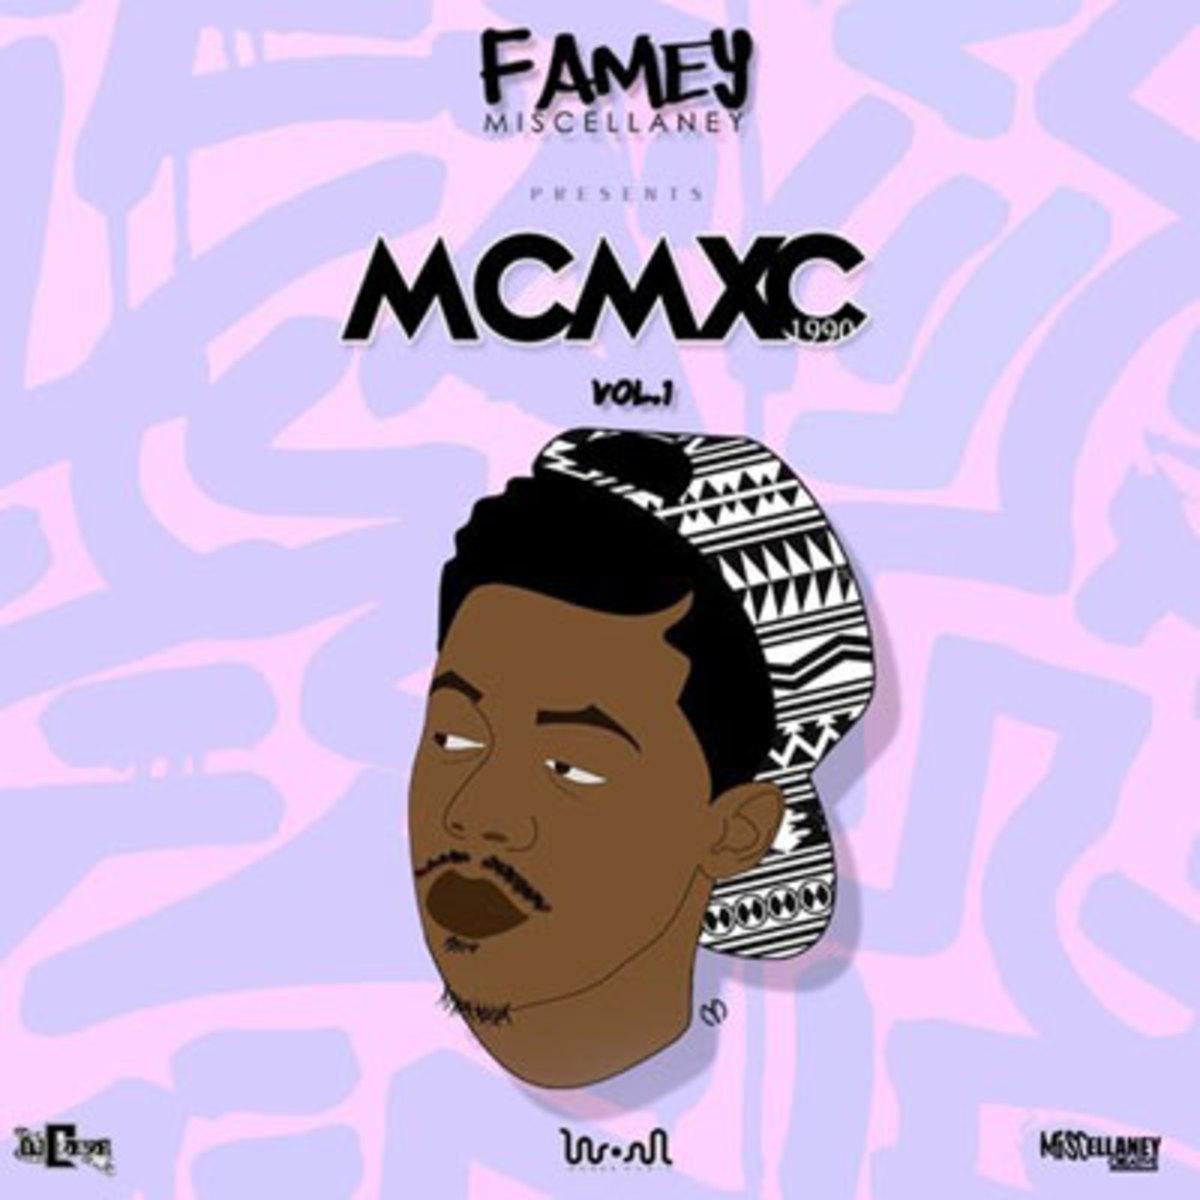 famey-mcmxc.jpg